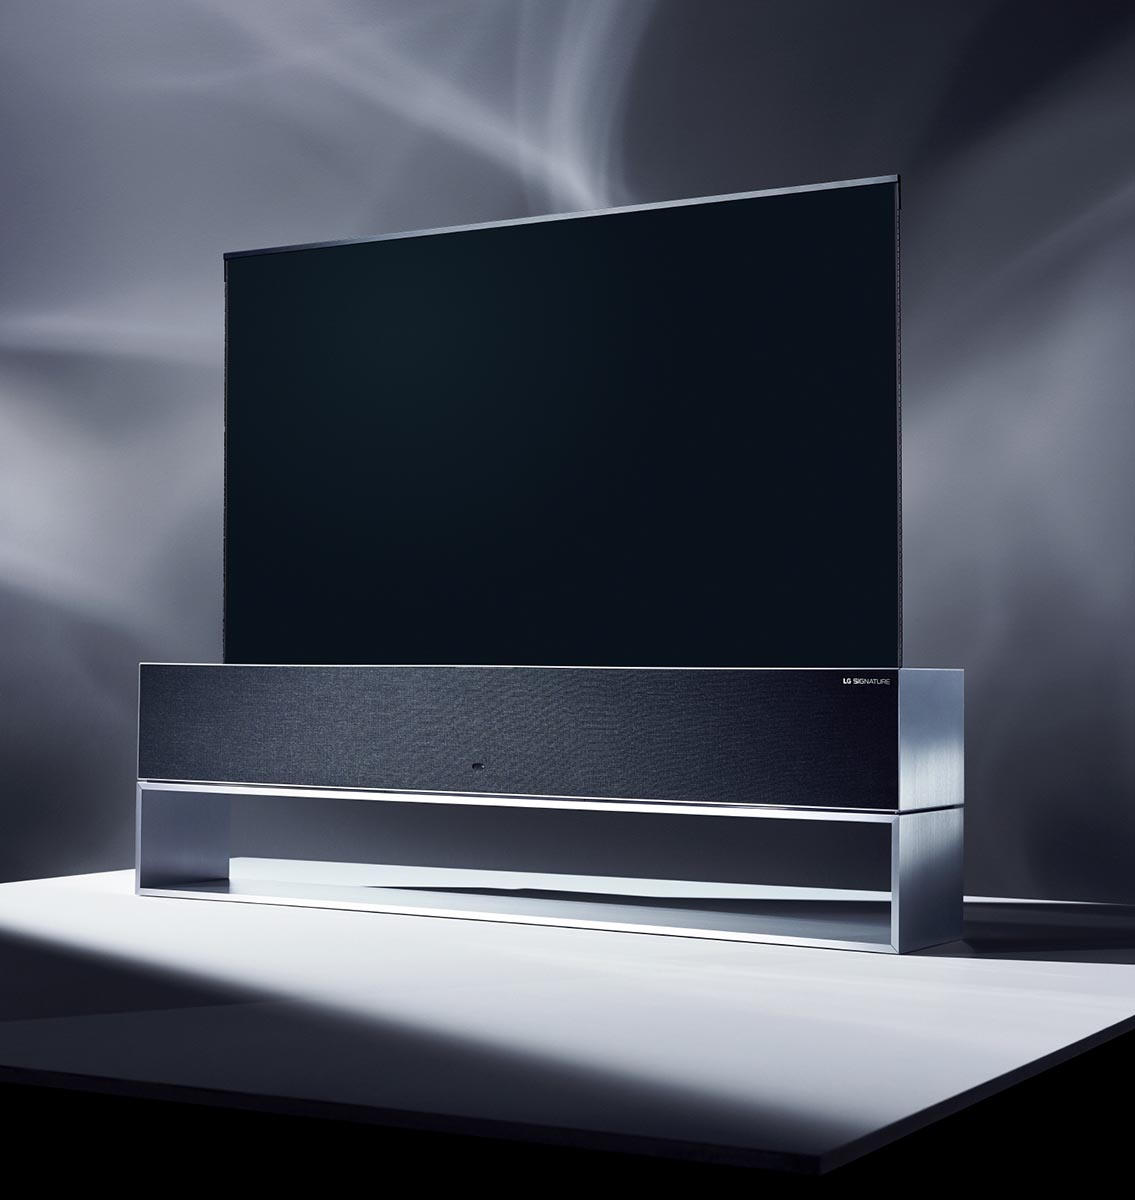 LG OLED TV R Product 02 (1)